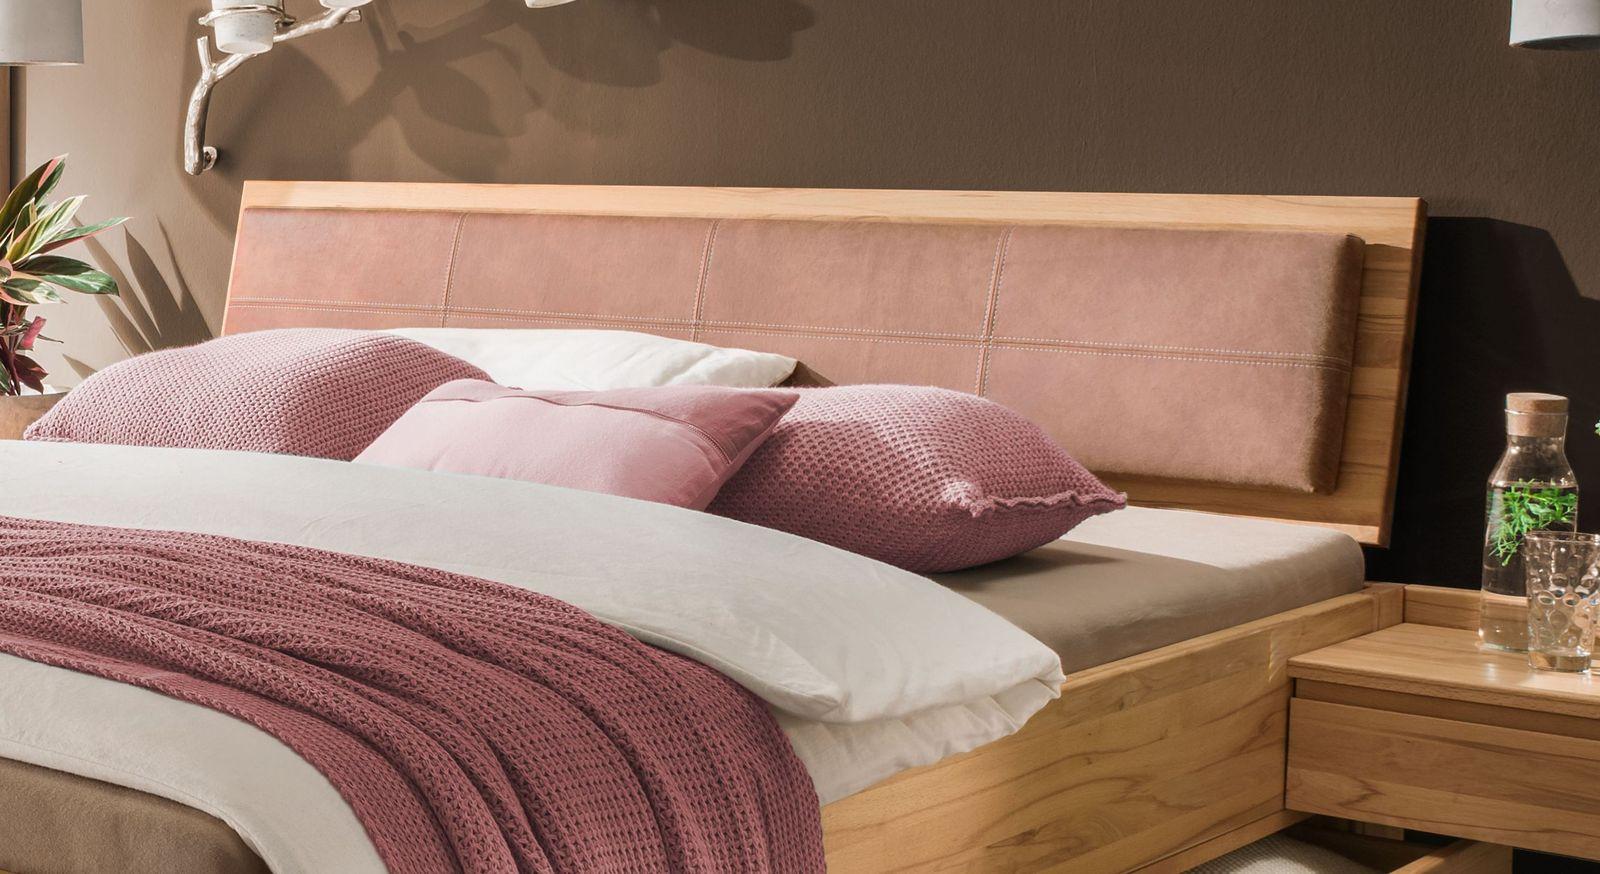 Schubkasten-Bett Aurachs Kopfteil inklusive Polster